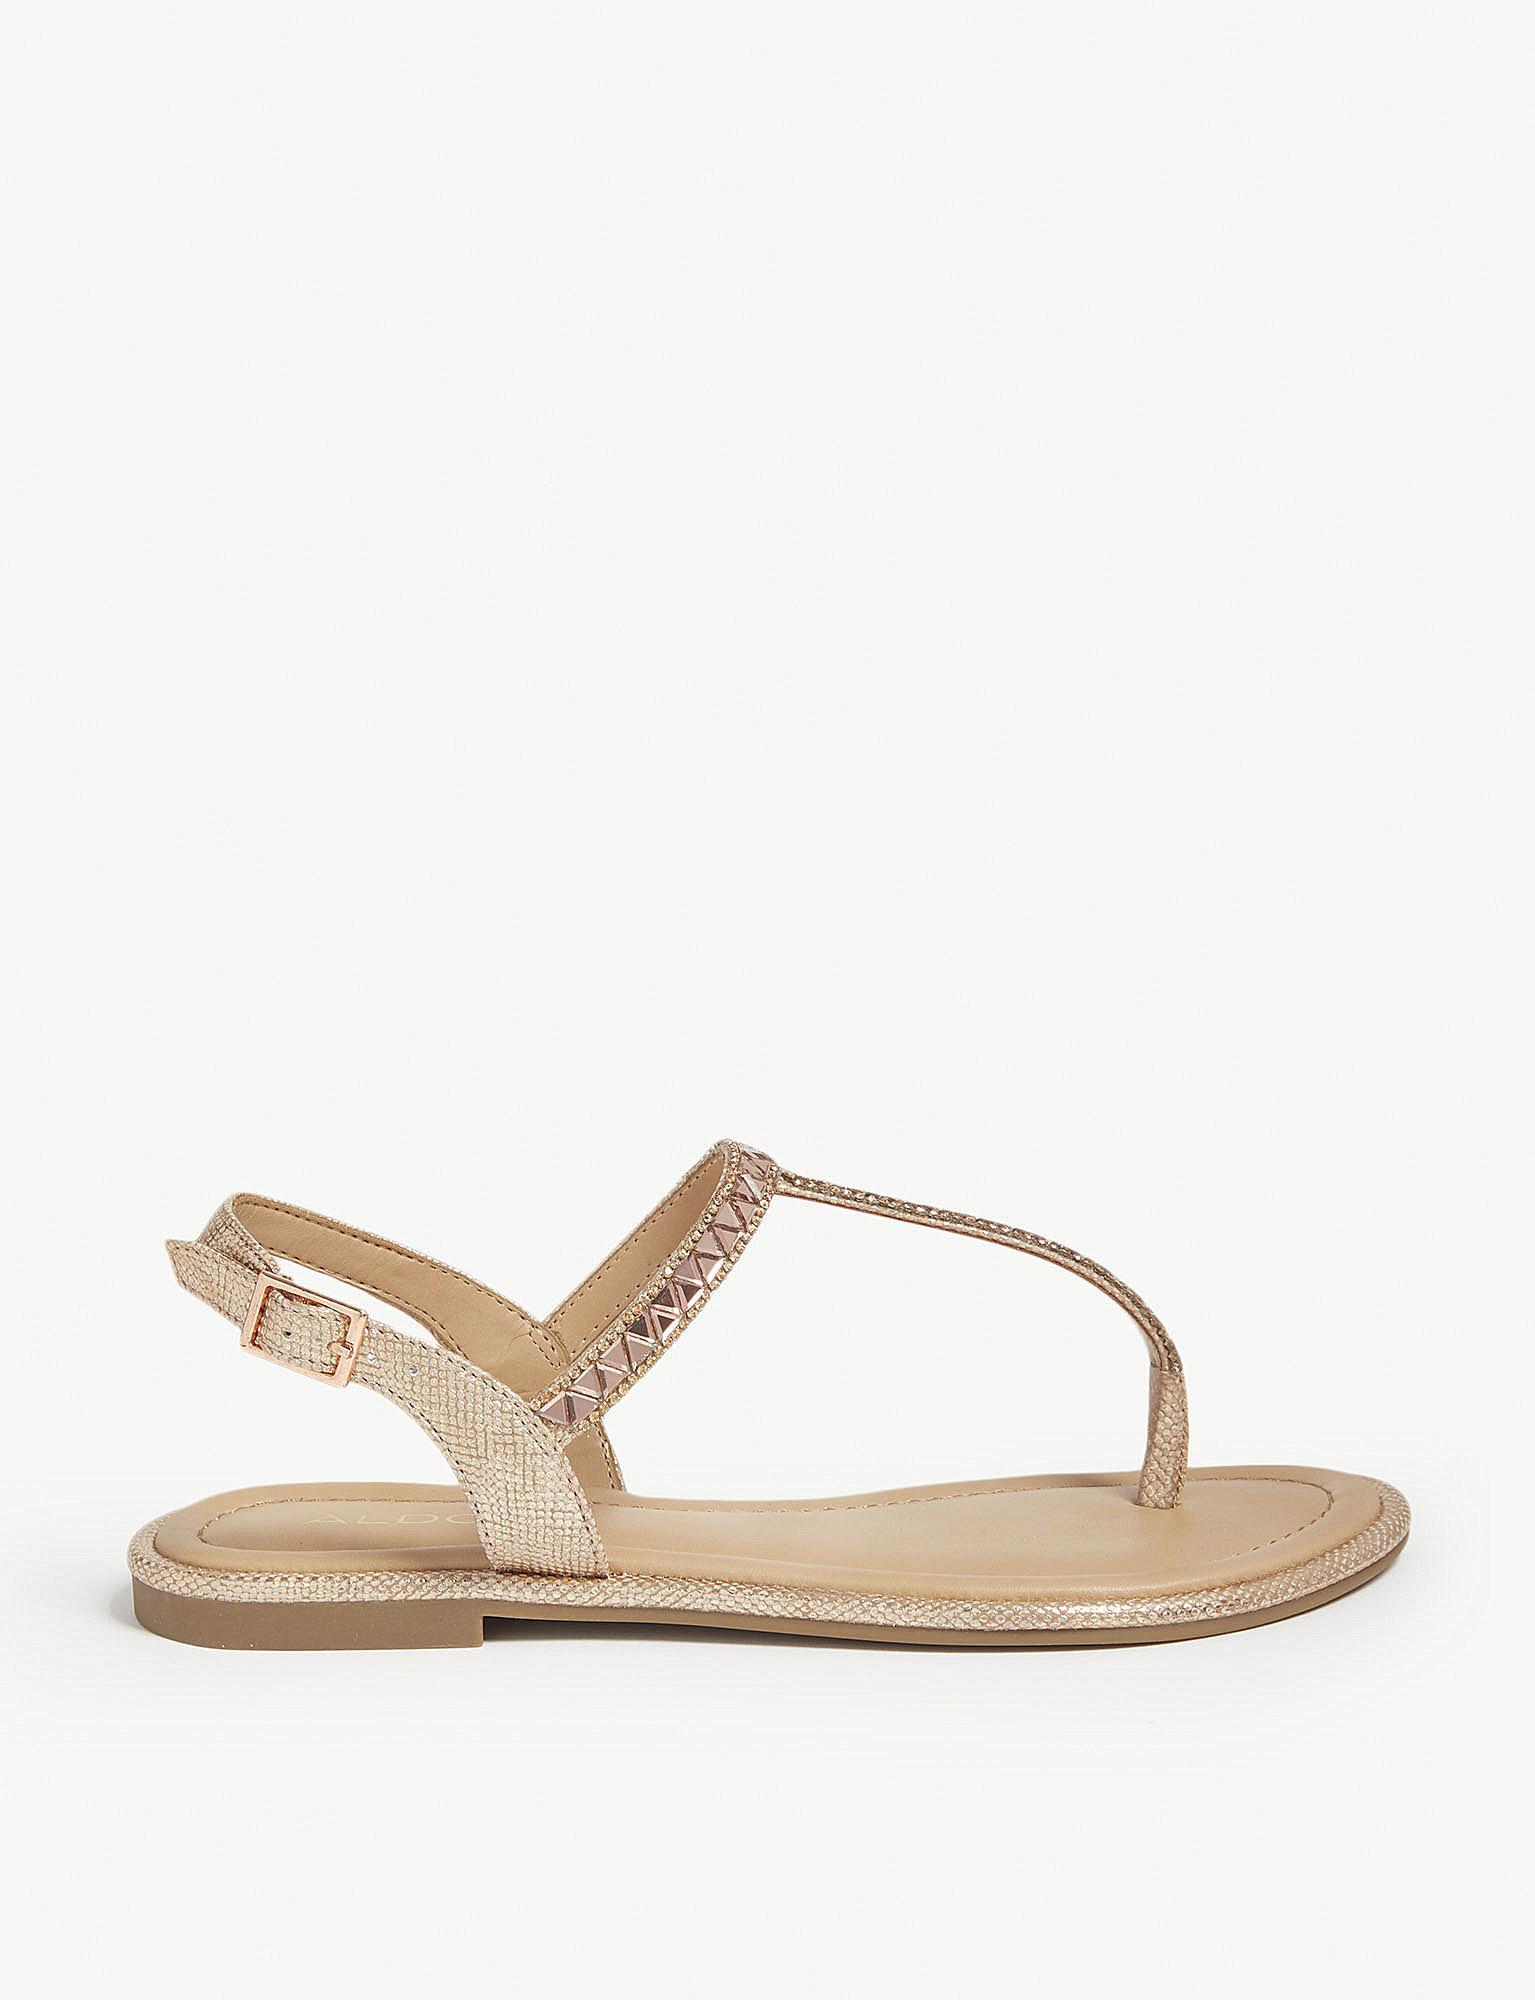 cd077419fb4a Lyst - Aldo Sheeny Embellished Flat Sandals in Metallic